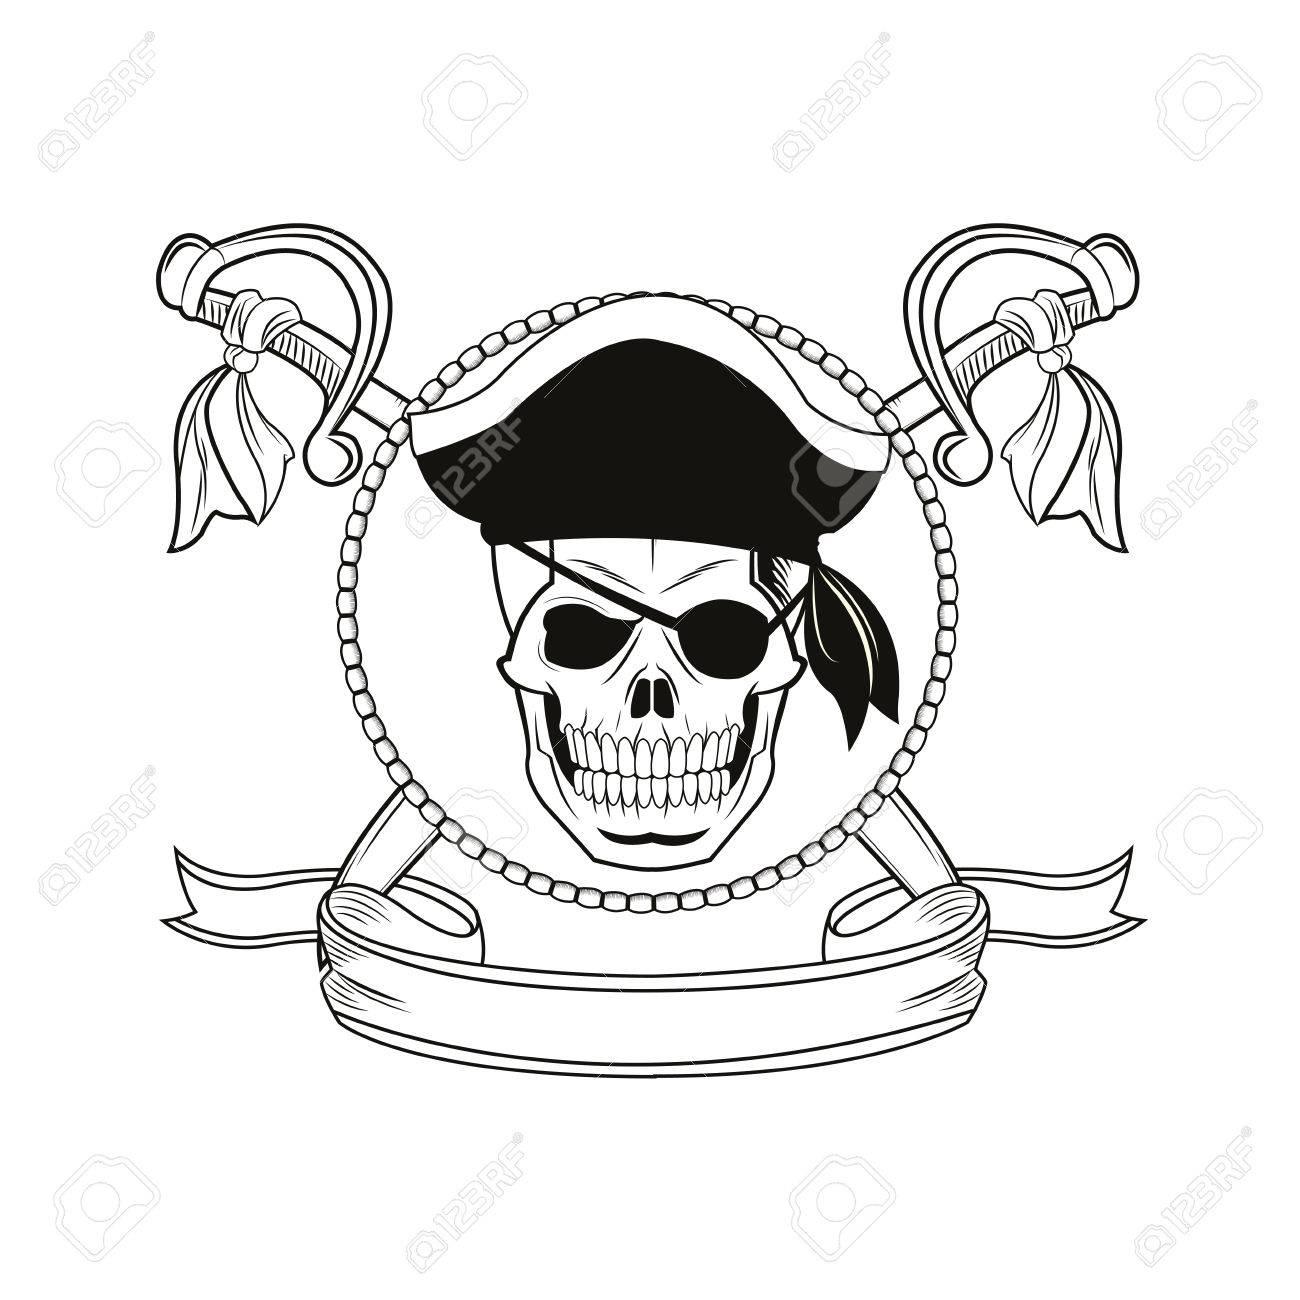 Cráneo Cinta Espada Pirata De Dibujos Animados Tatuaje Marina Icono ...